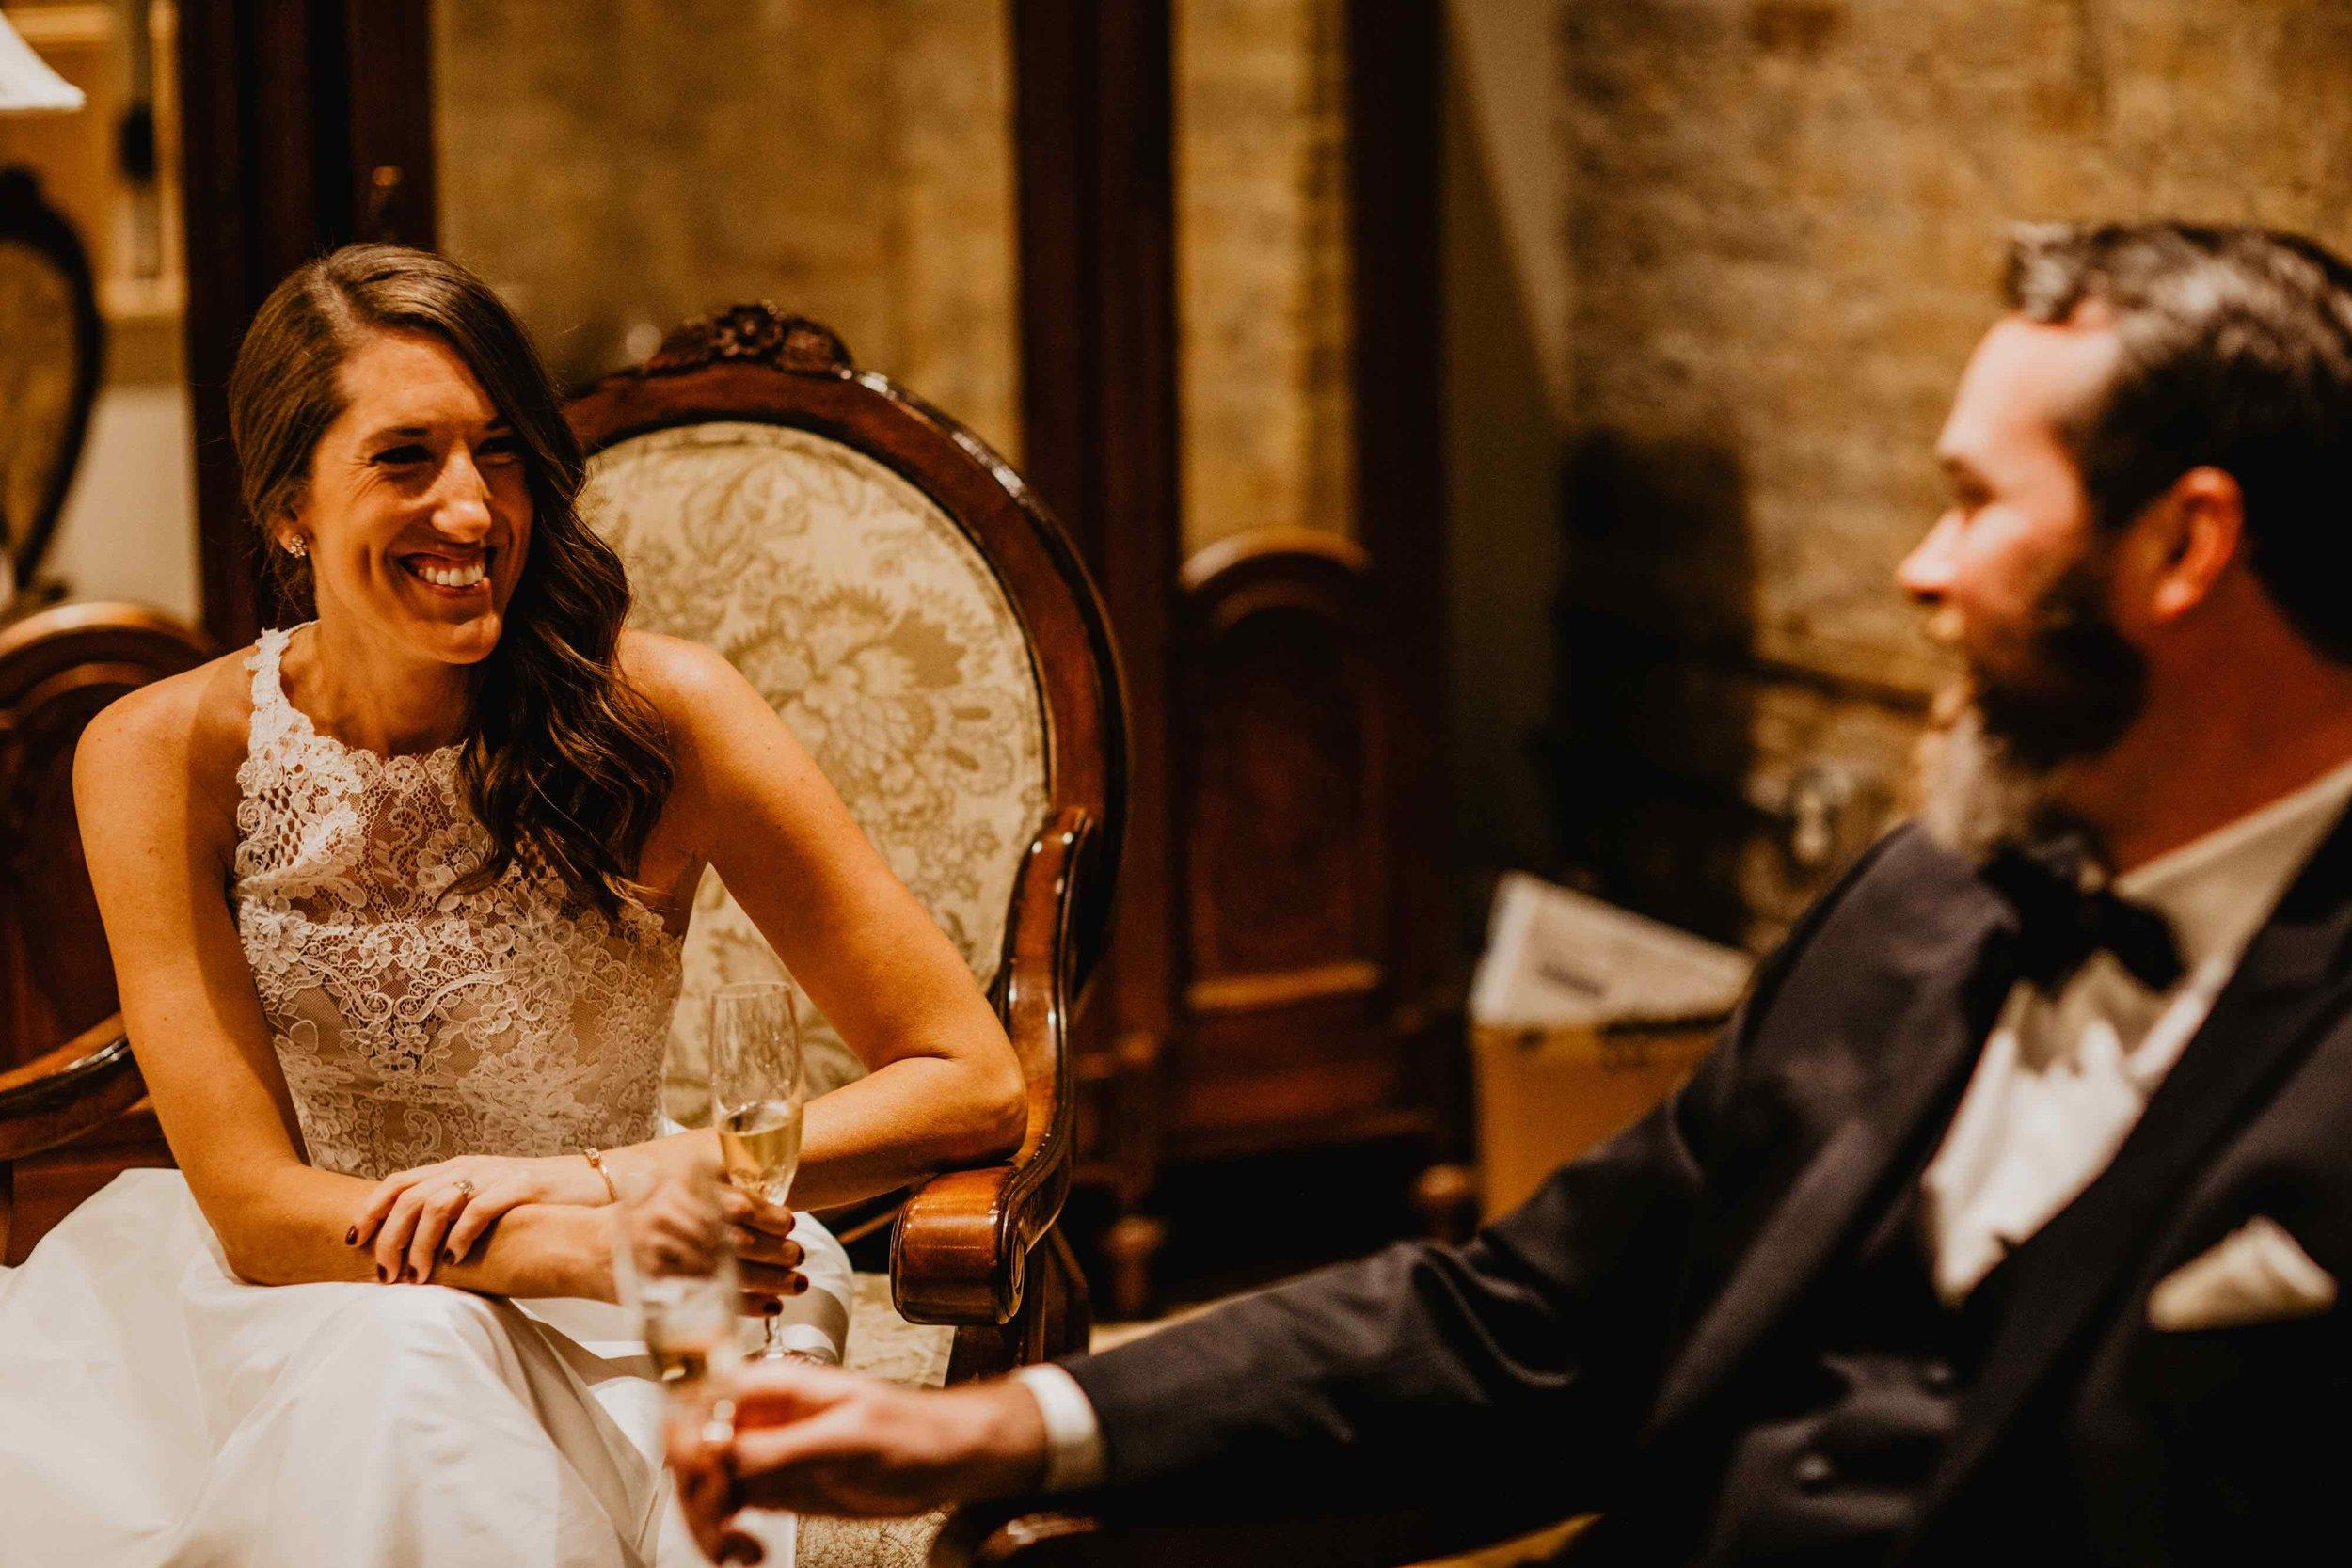 Kisa Conrad Favorites-0025-colorado-wedding-photographer-denver-springs-vailhotel-glenwood-springs-colorado-wedding-photographer.jpeg